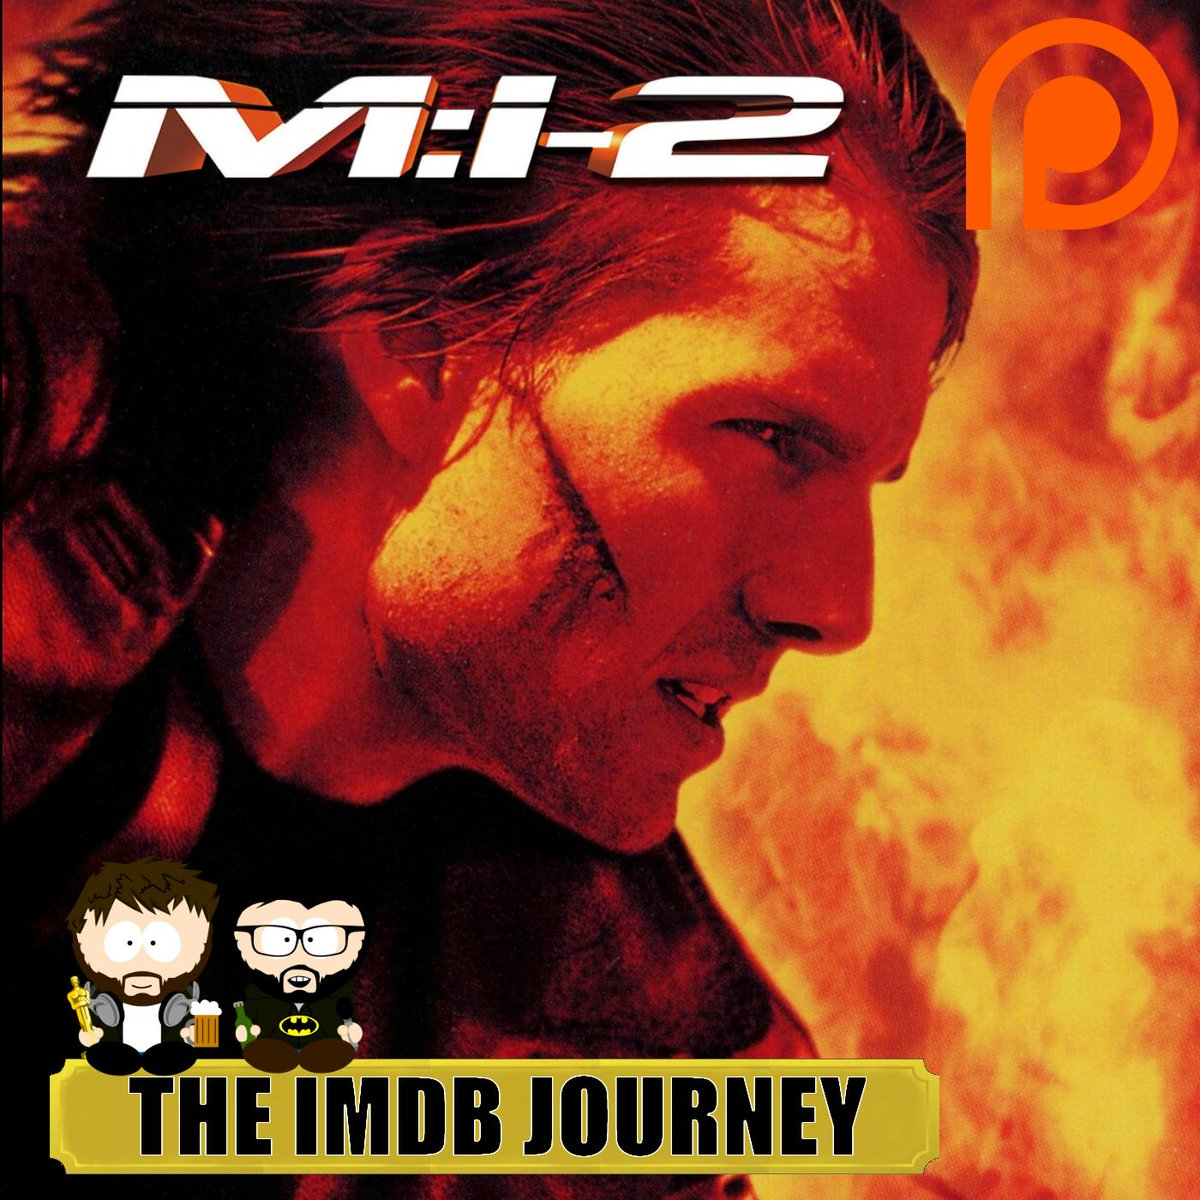 The IMDB Journey Podcast (@imdbjourney) | Twitter